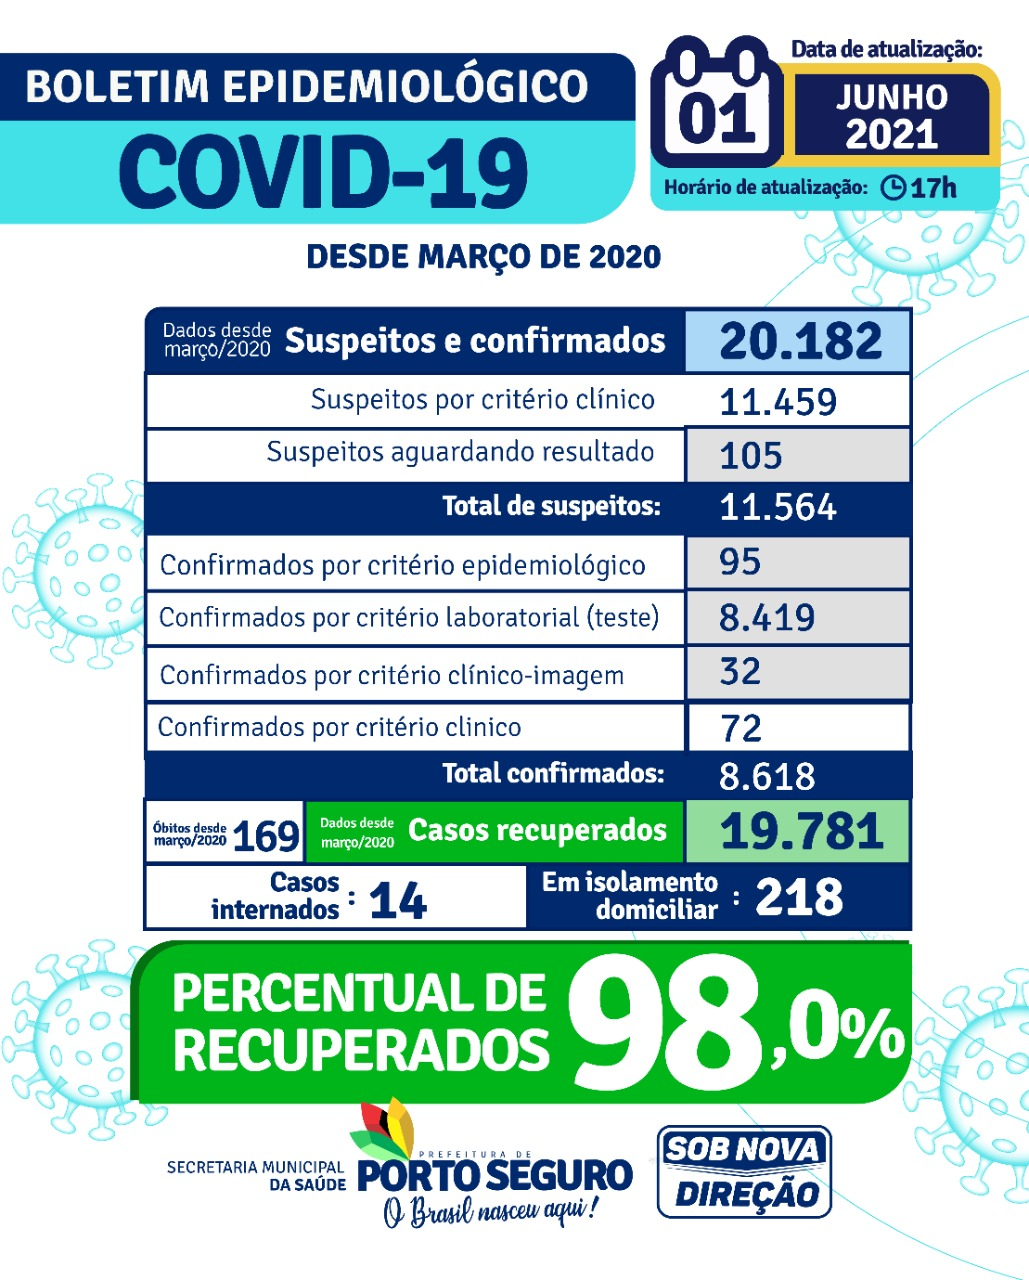 Porto Seguro: Boletim Epidemiológico Covid-19 (01/Junho) 24